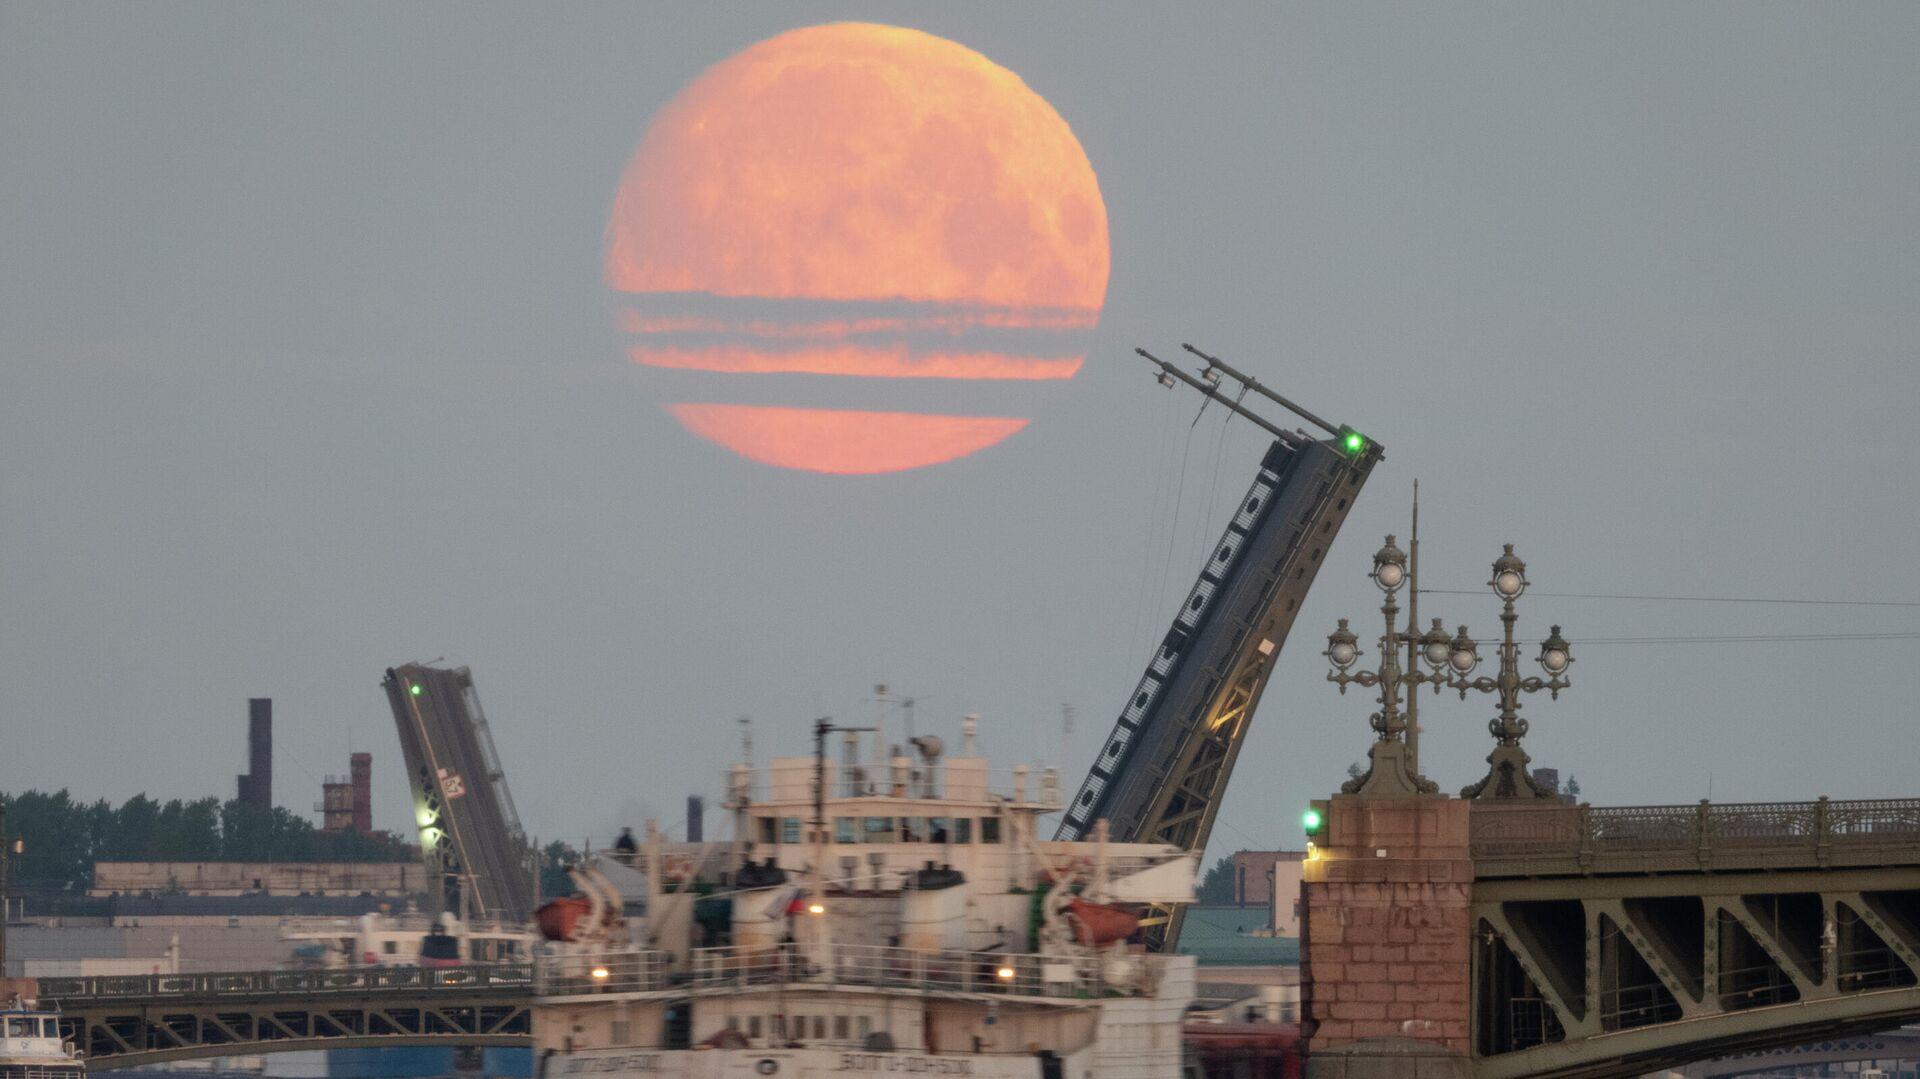 Луна над Санкт-Петербургом. 25 мая 2021 - РИА Новости, 1920, 19.06.2021